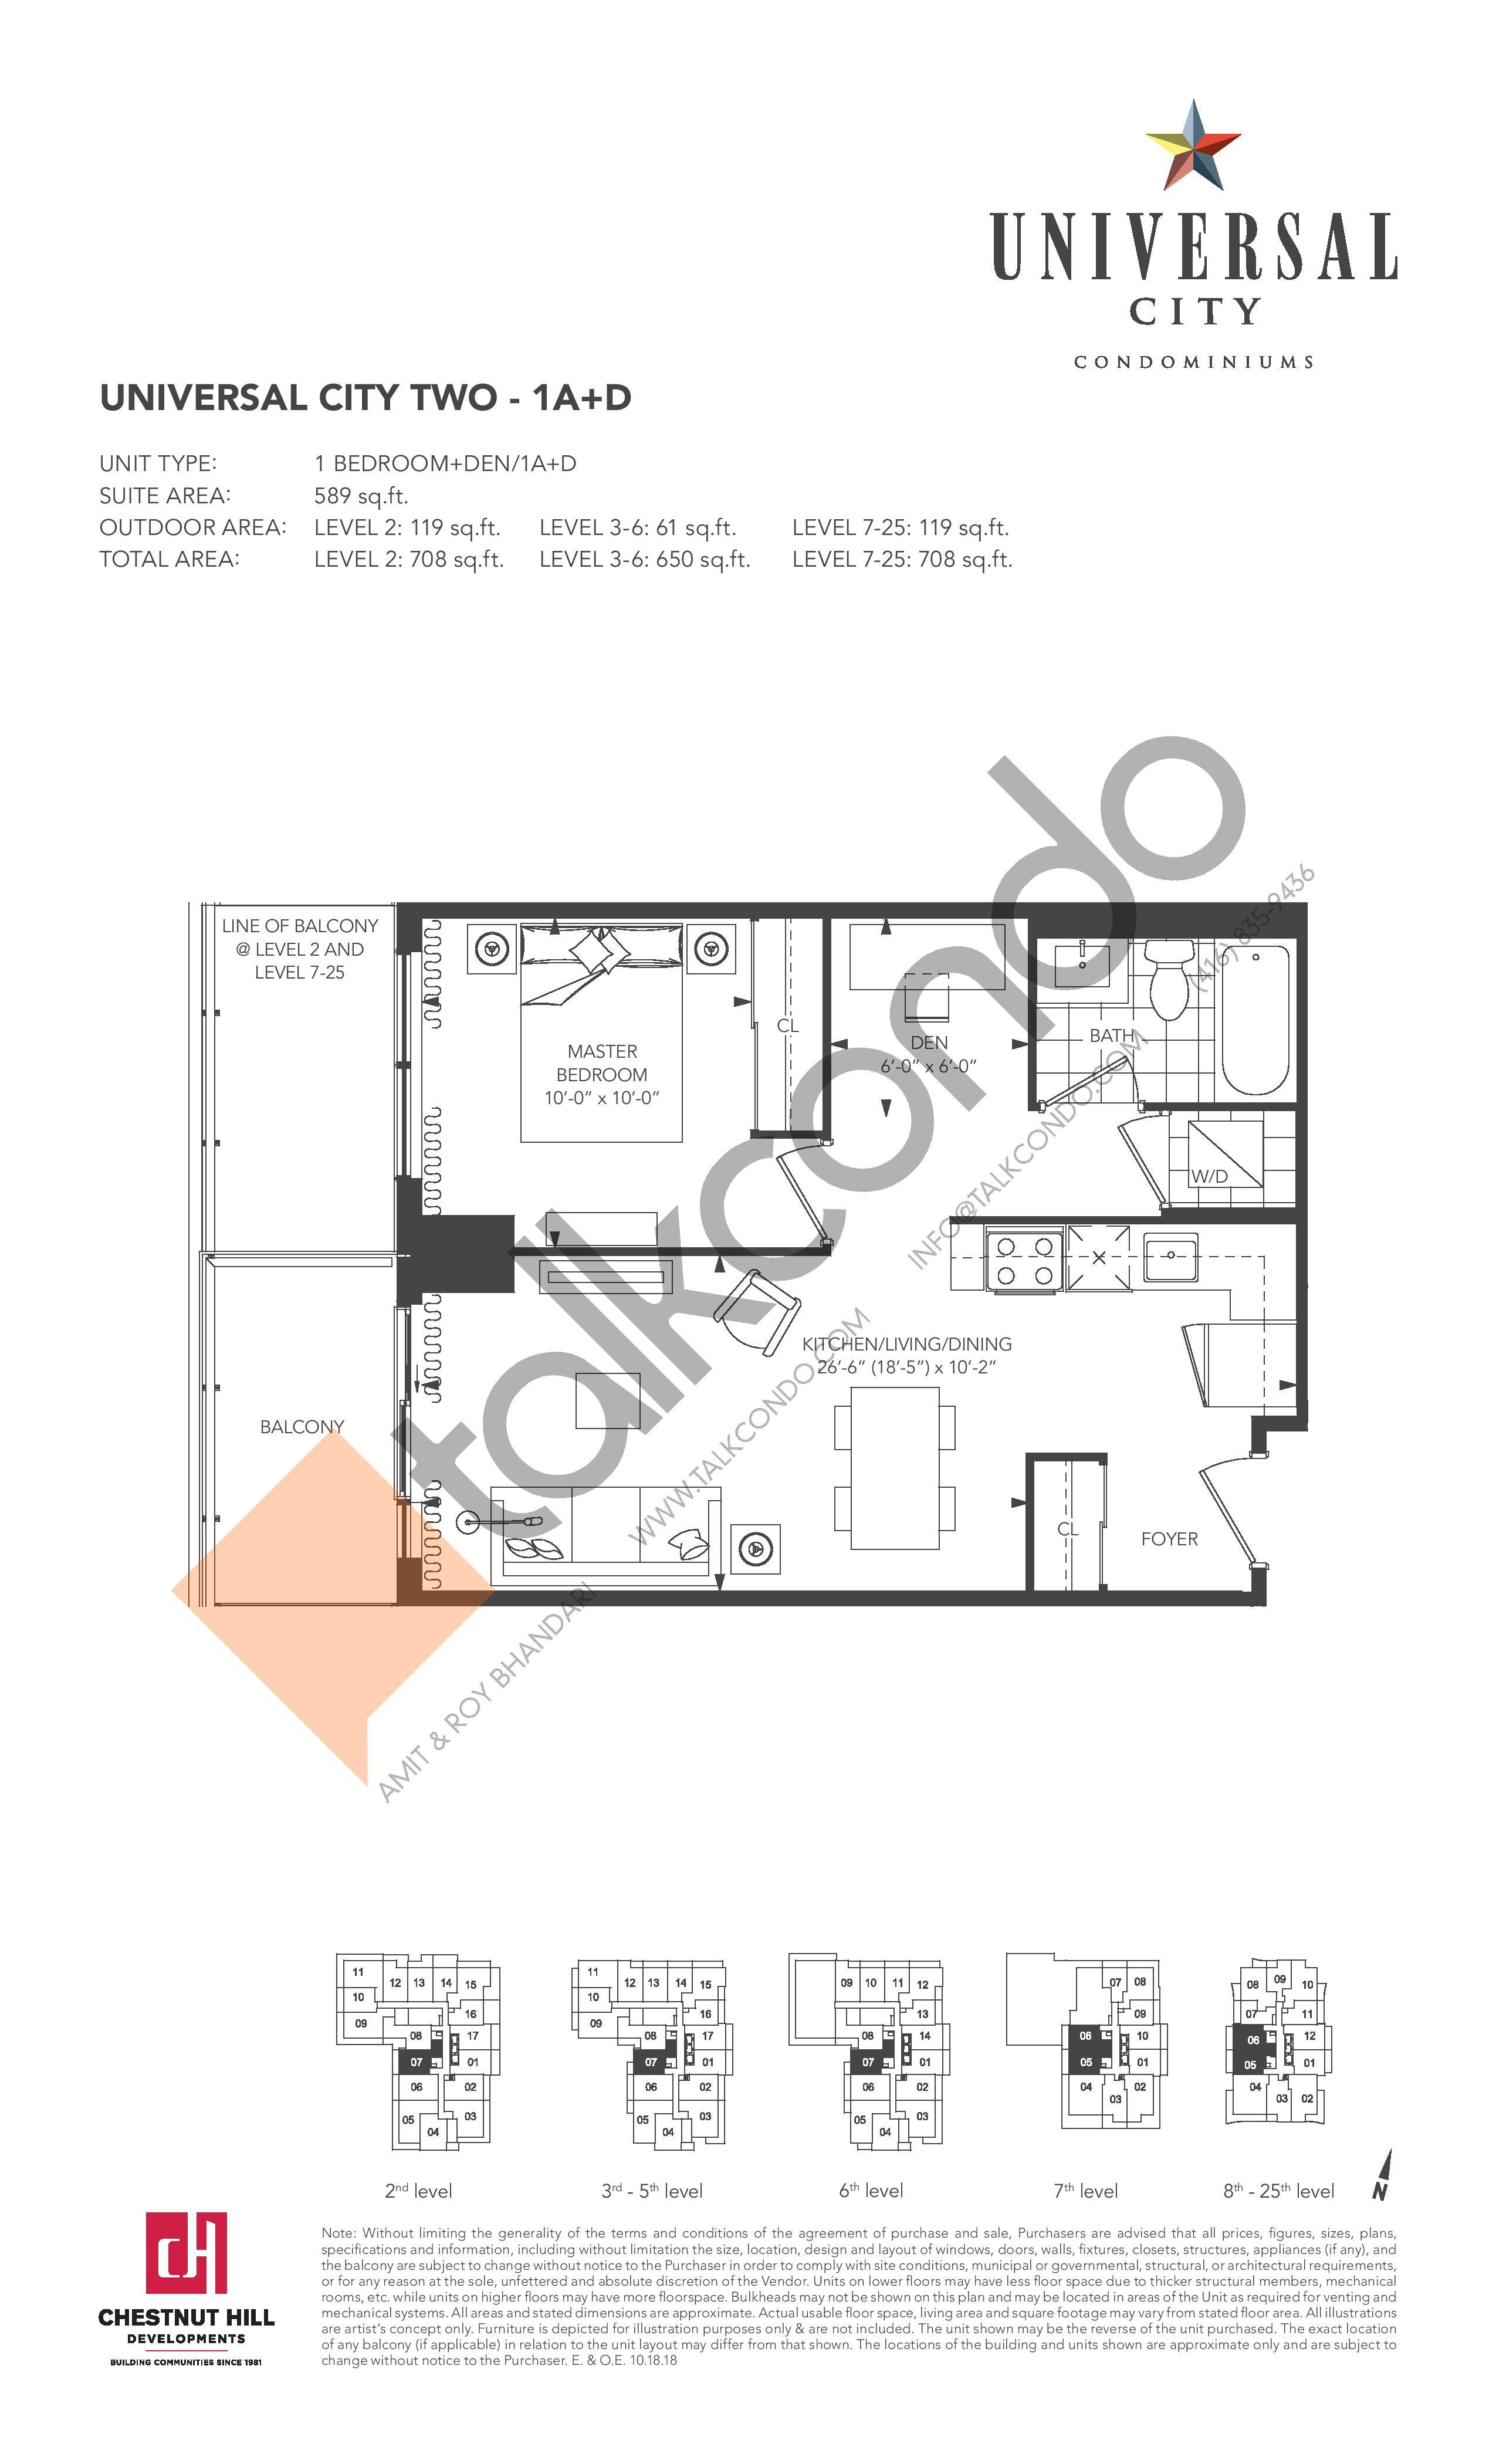 1A+D Floor Plan at Universal City 2 Condos - 589 sq.ft